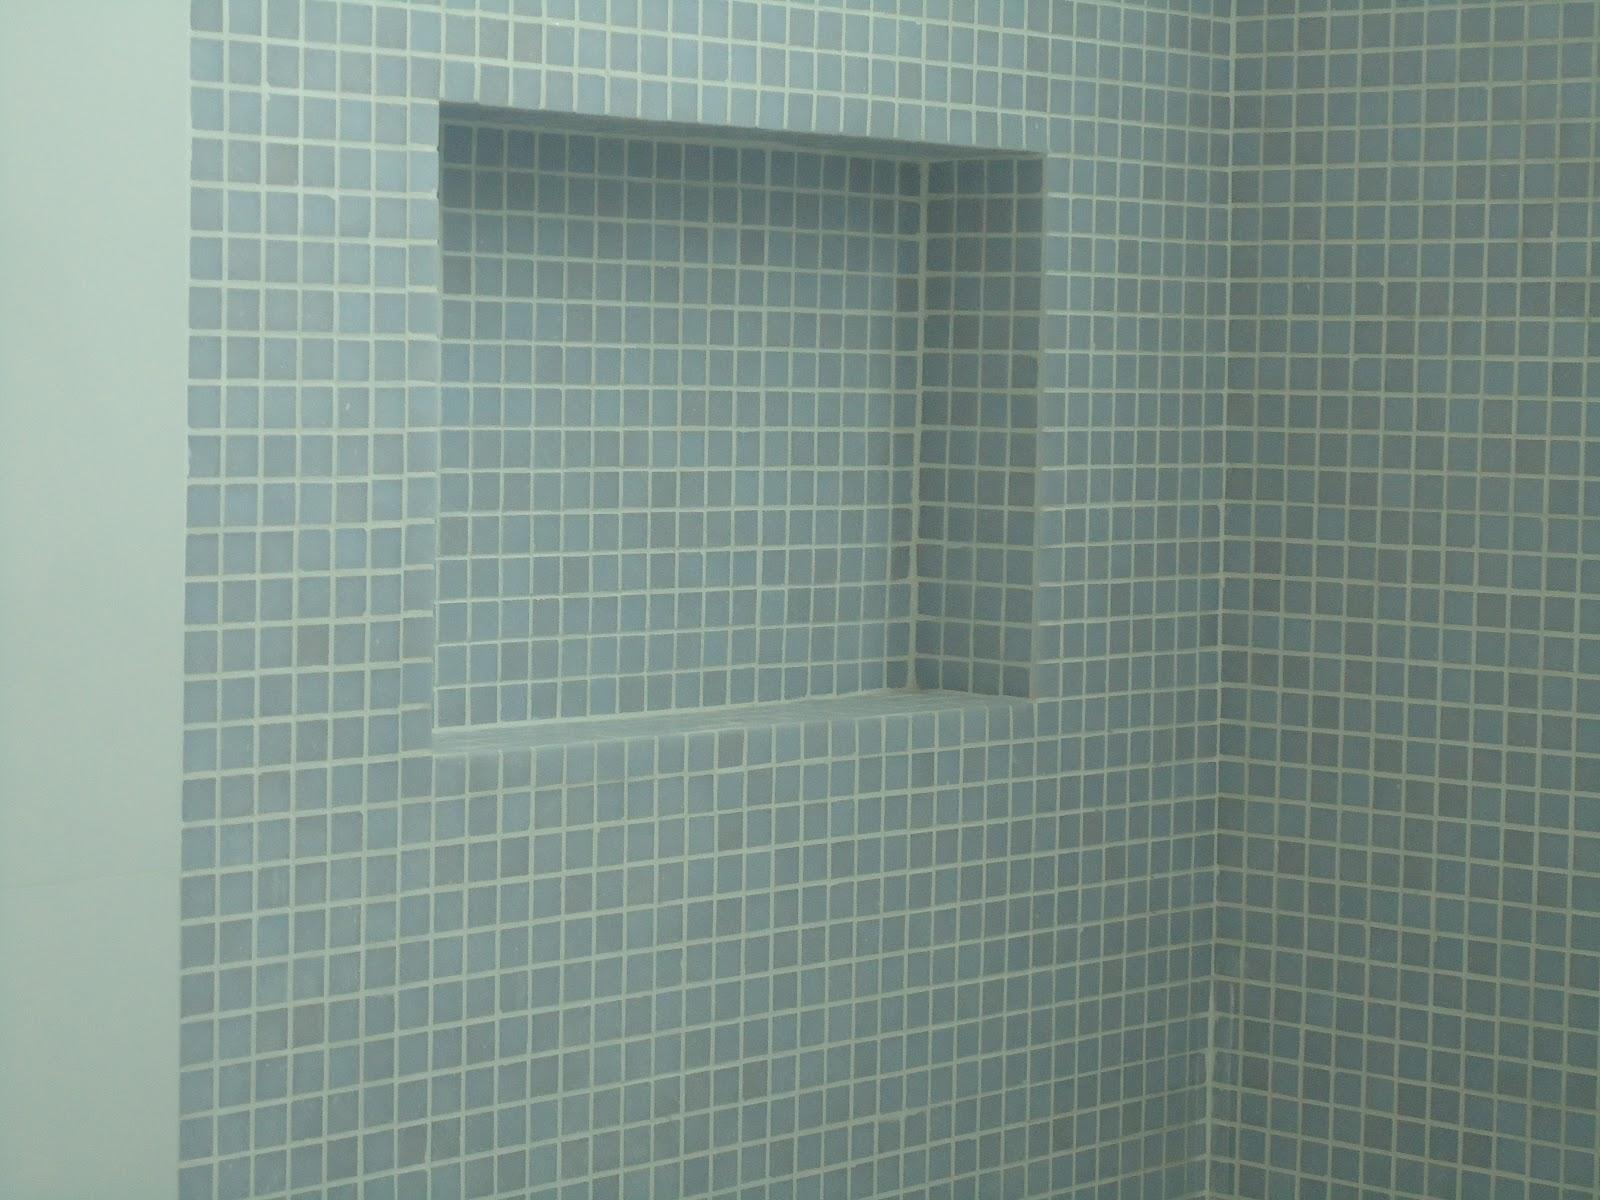 Pastilha resina cinza claro Jatobá (esse buraco retangular é u  #567562 1600x1200 Banheiro Cinza Claro